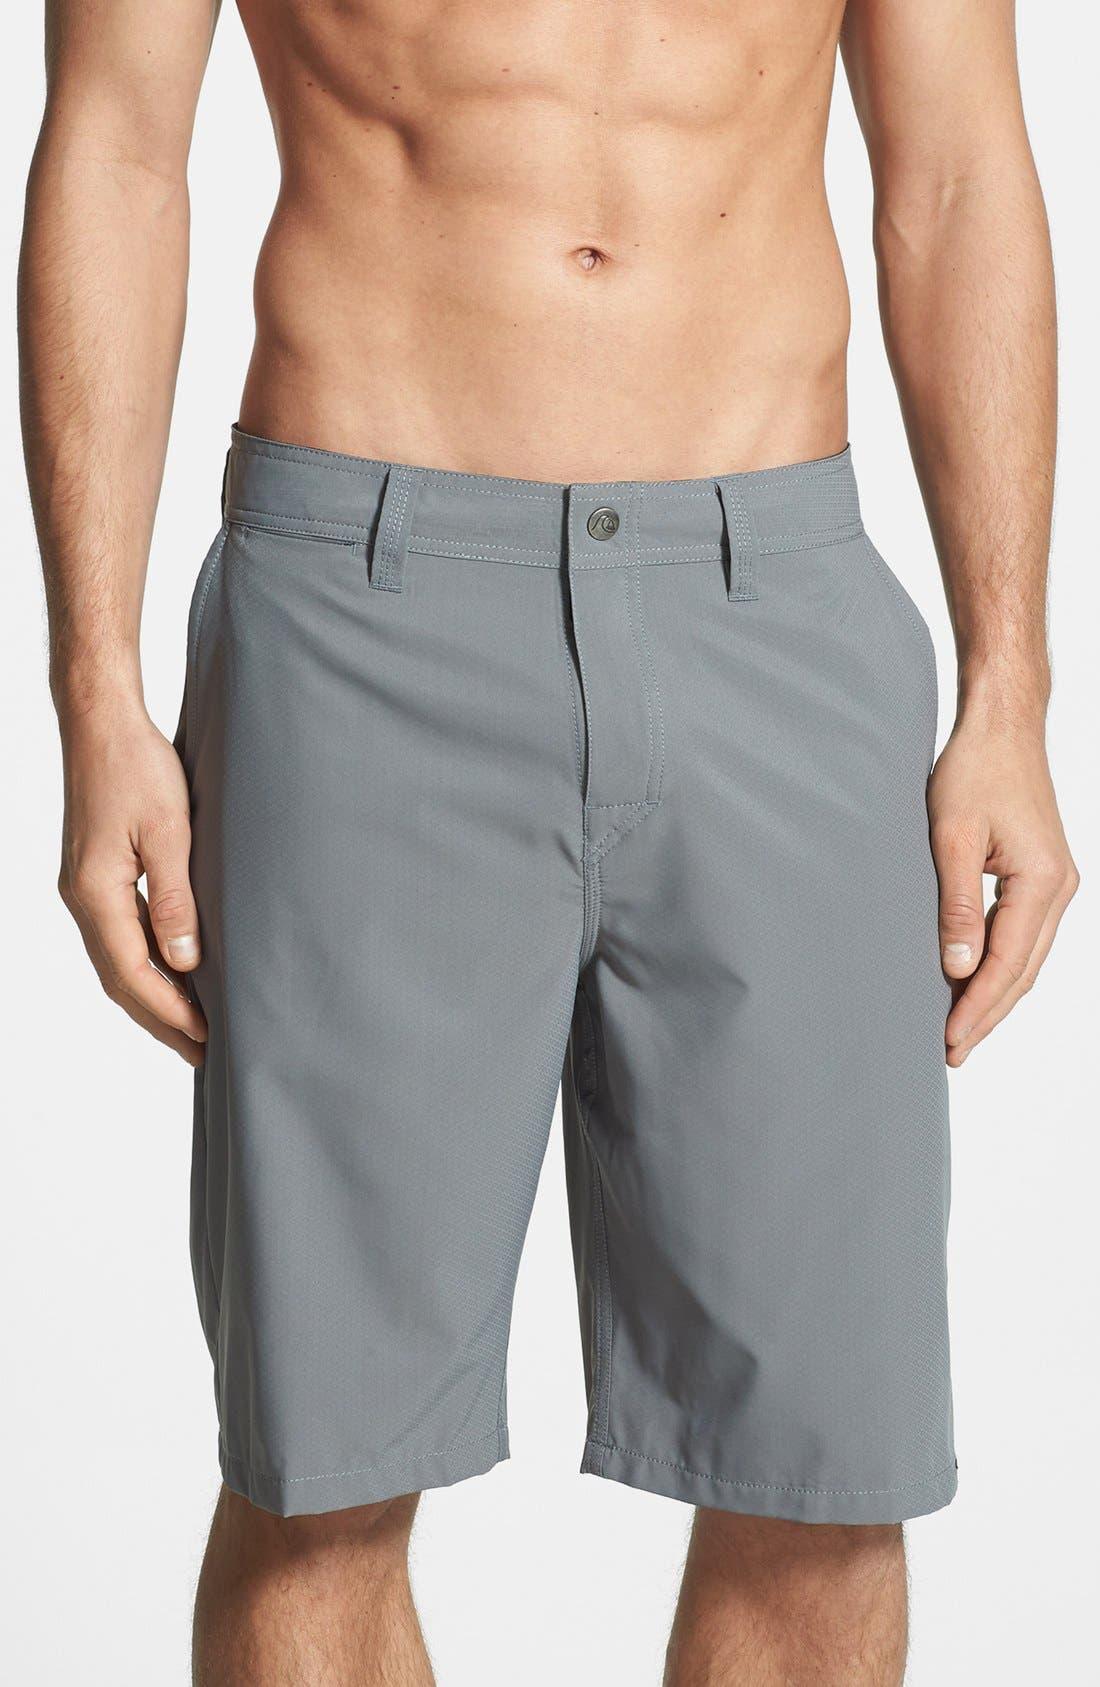 Alternate Image 1 Selected - Quiksilver 'Dry Dock' Hybrid Shorts